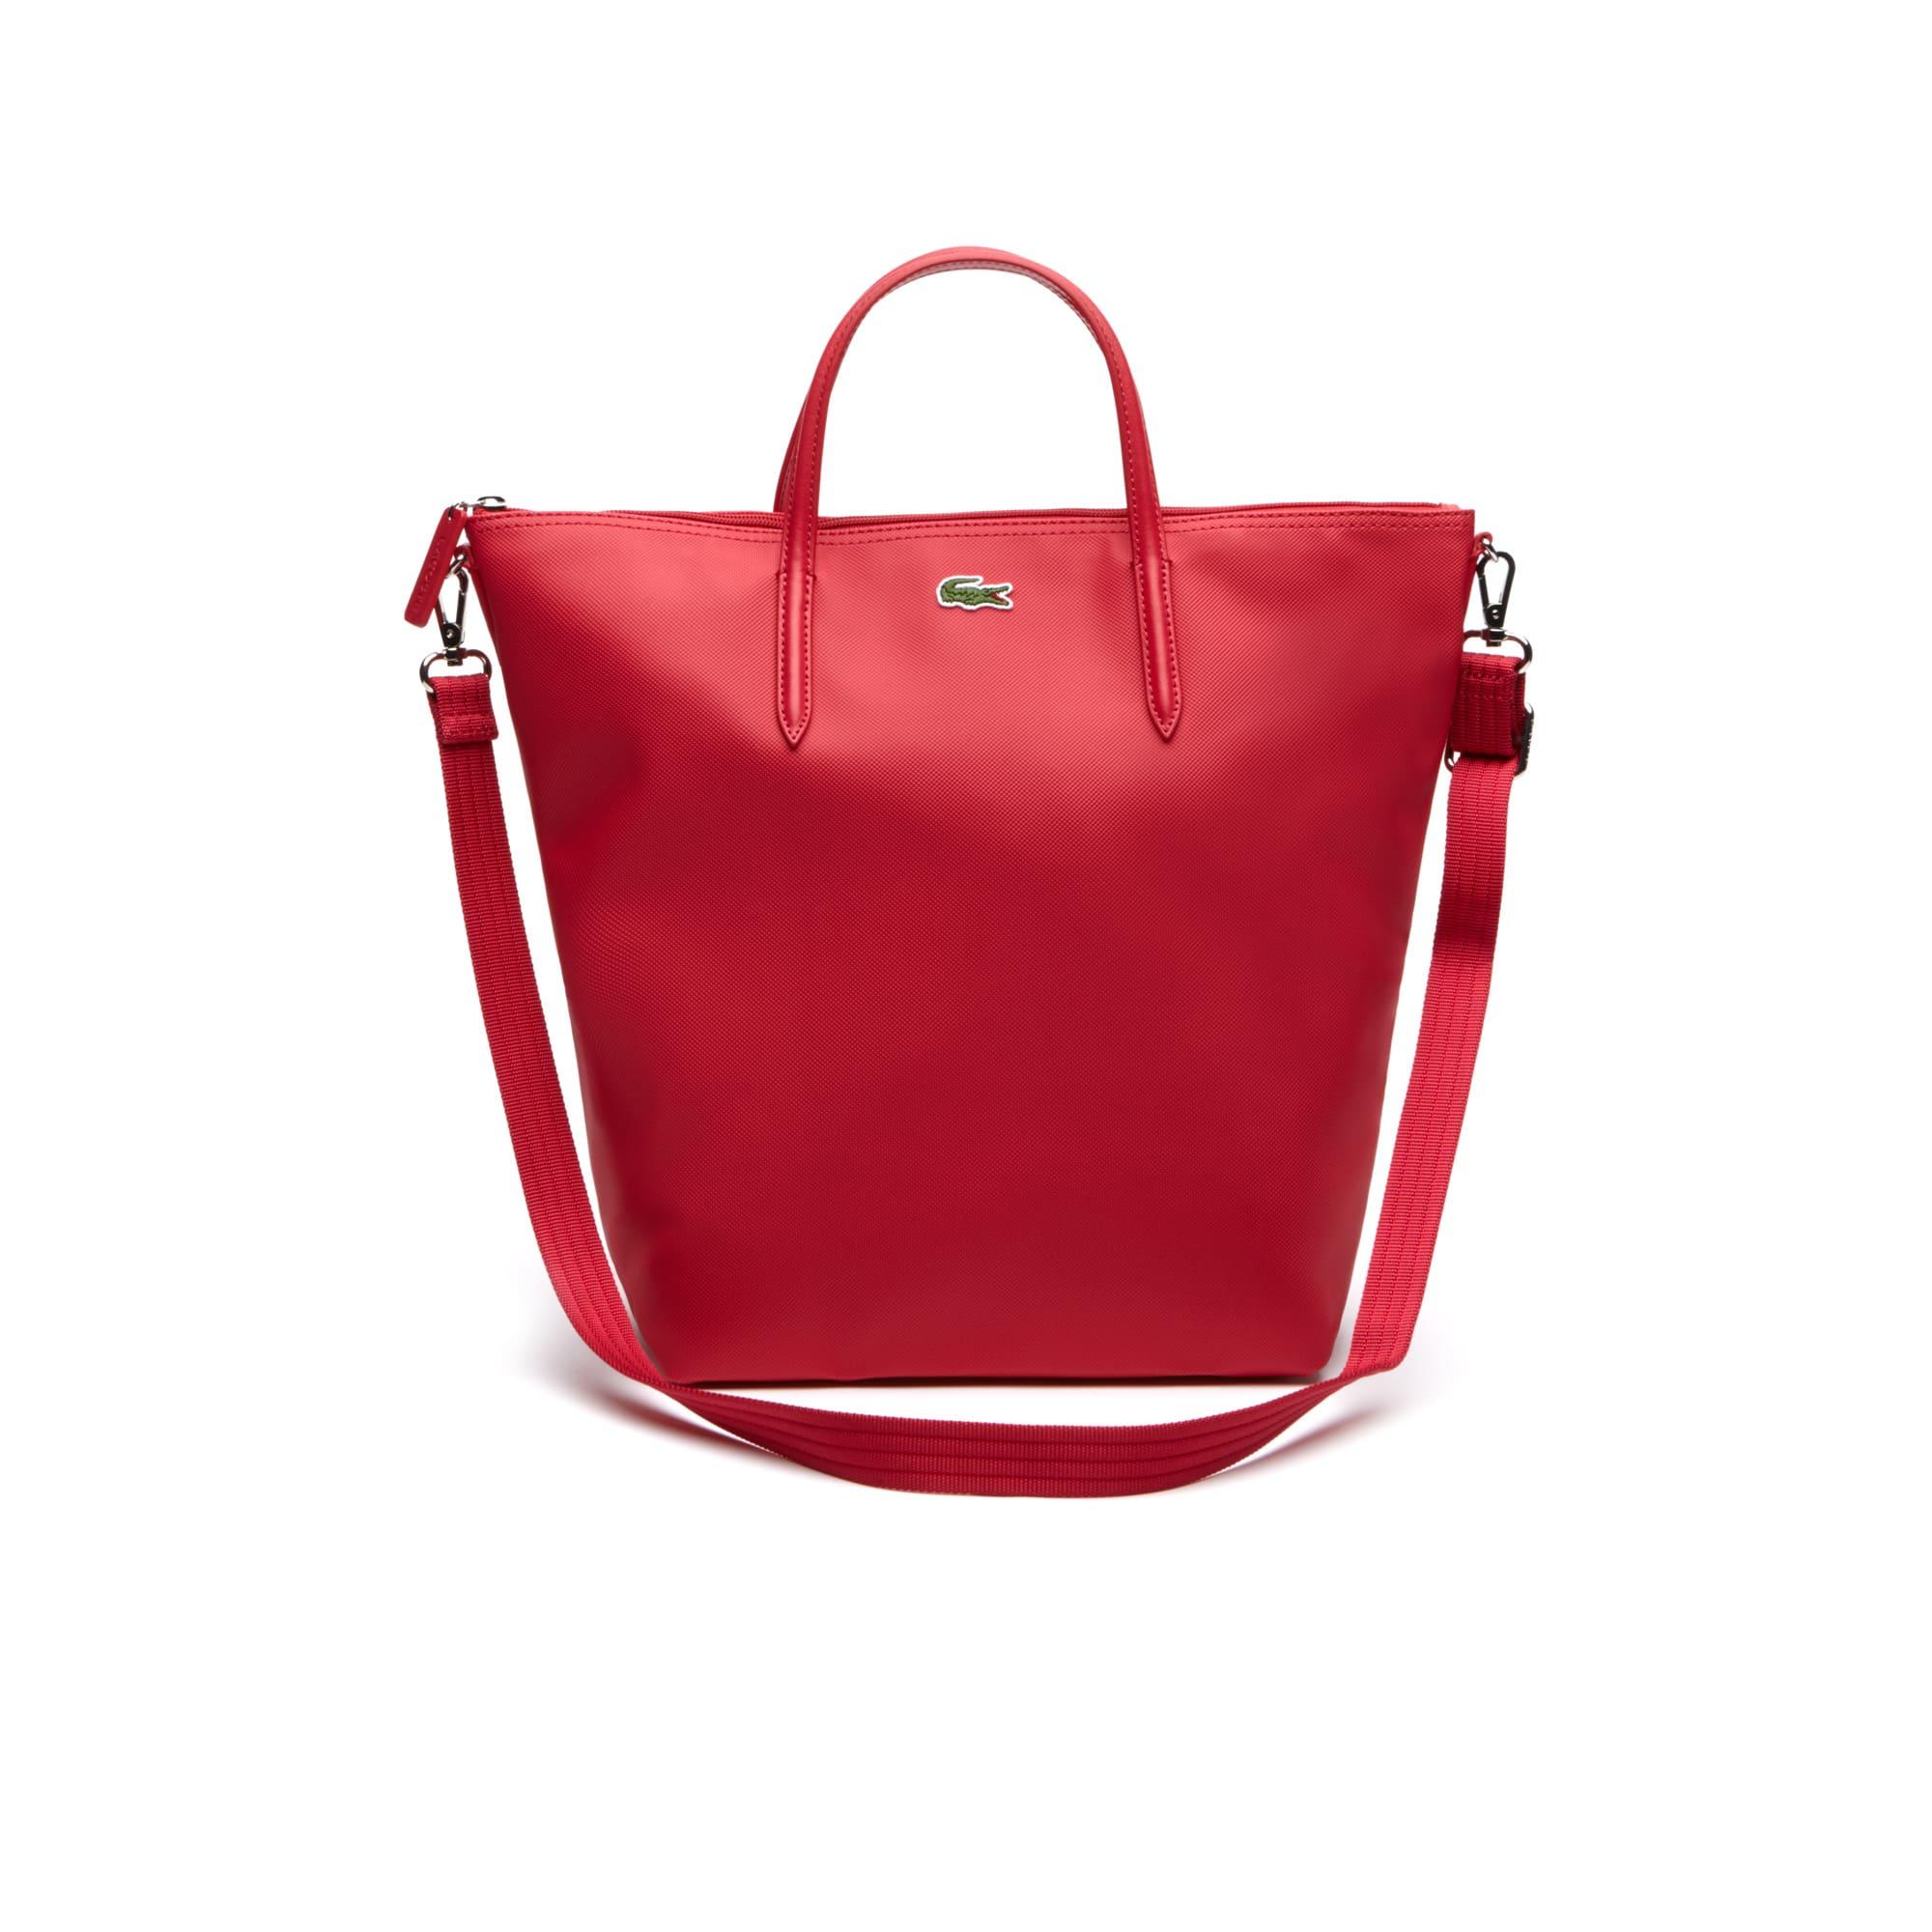 Women's L.12.12 Concept Dual Carry Vertical Tote Bag